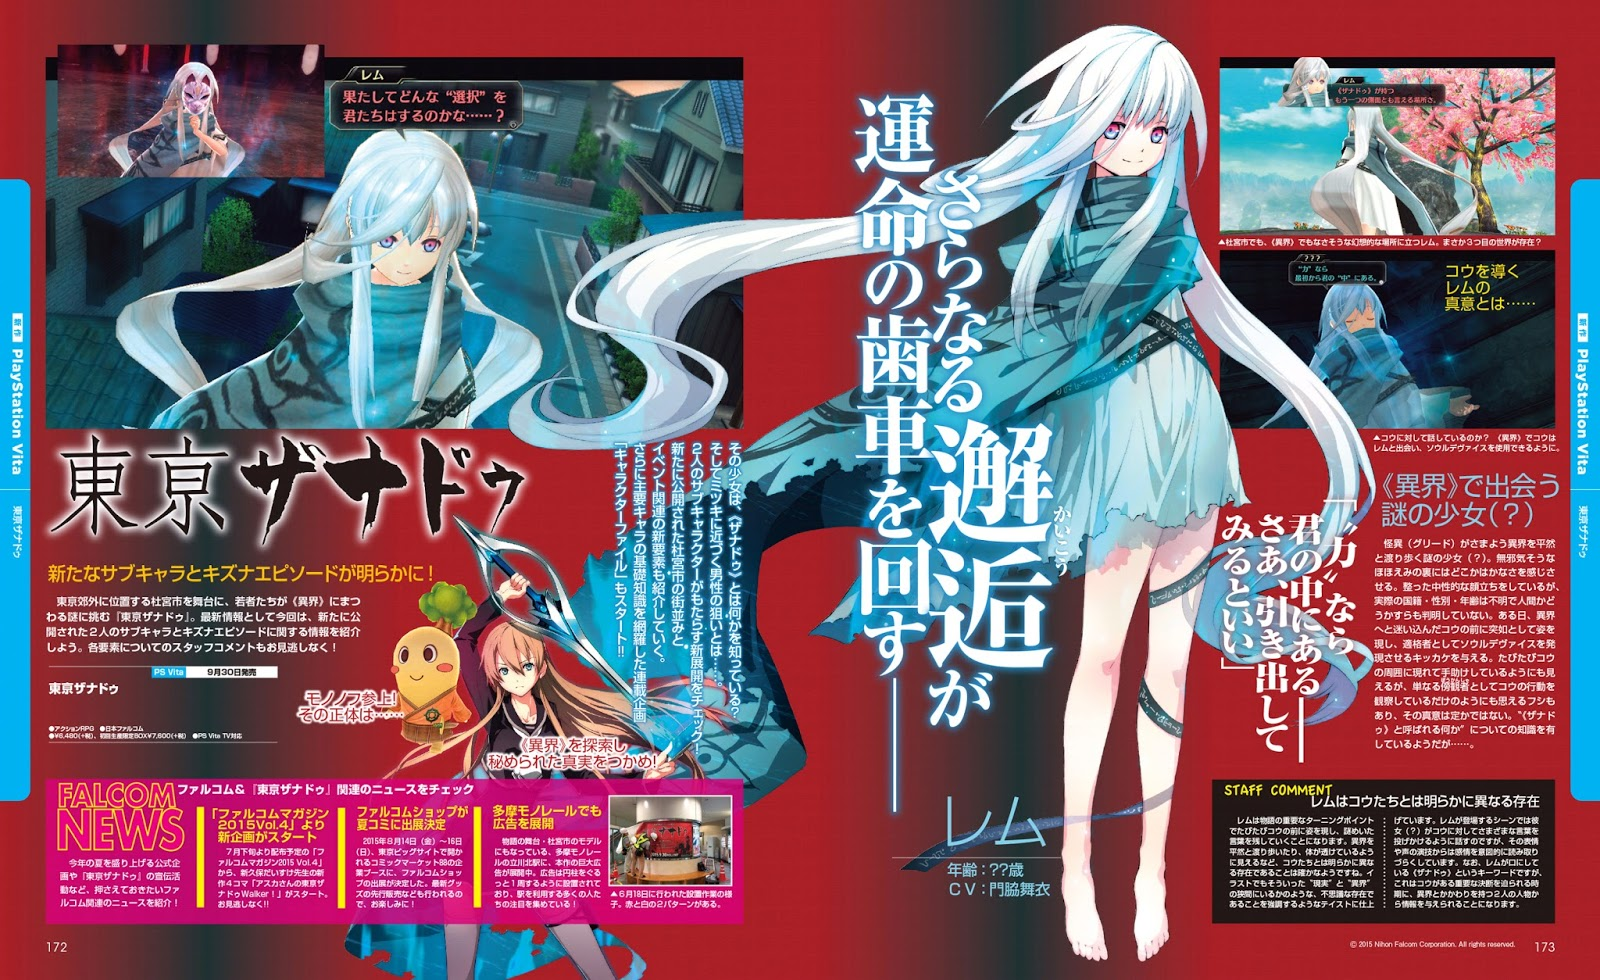 Tokyo Xanadu - Matéria da Famitsu / Dengeki PlayStation (08 07 15